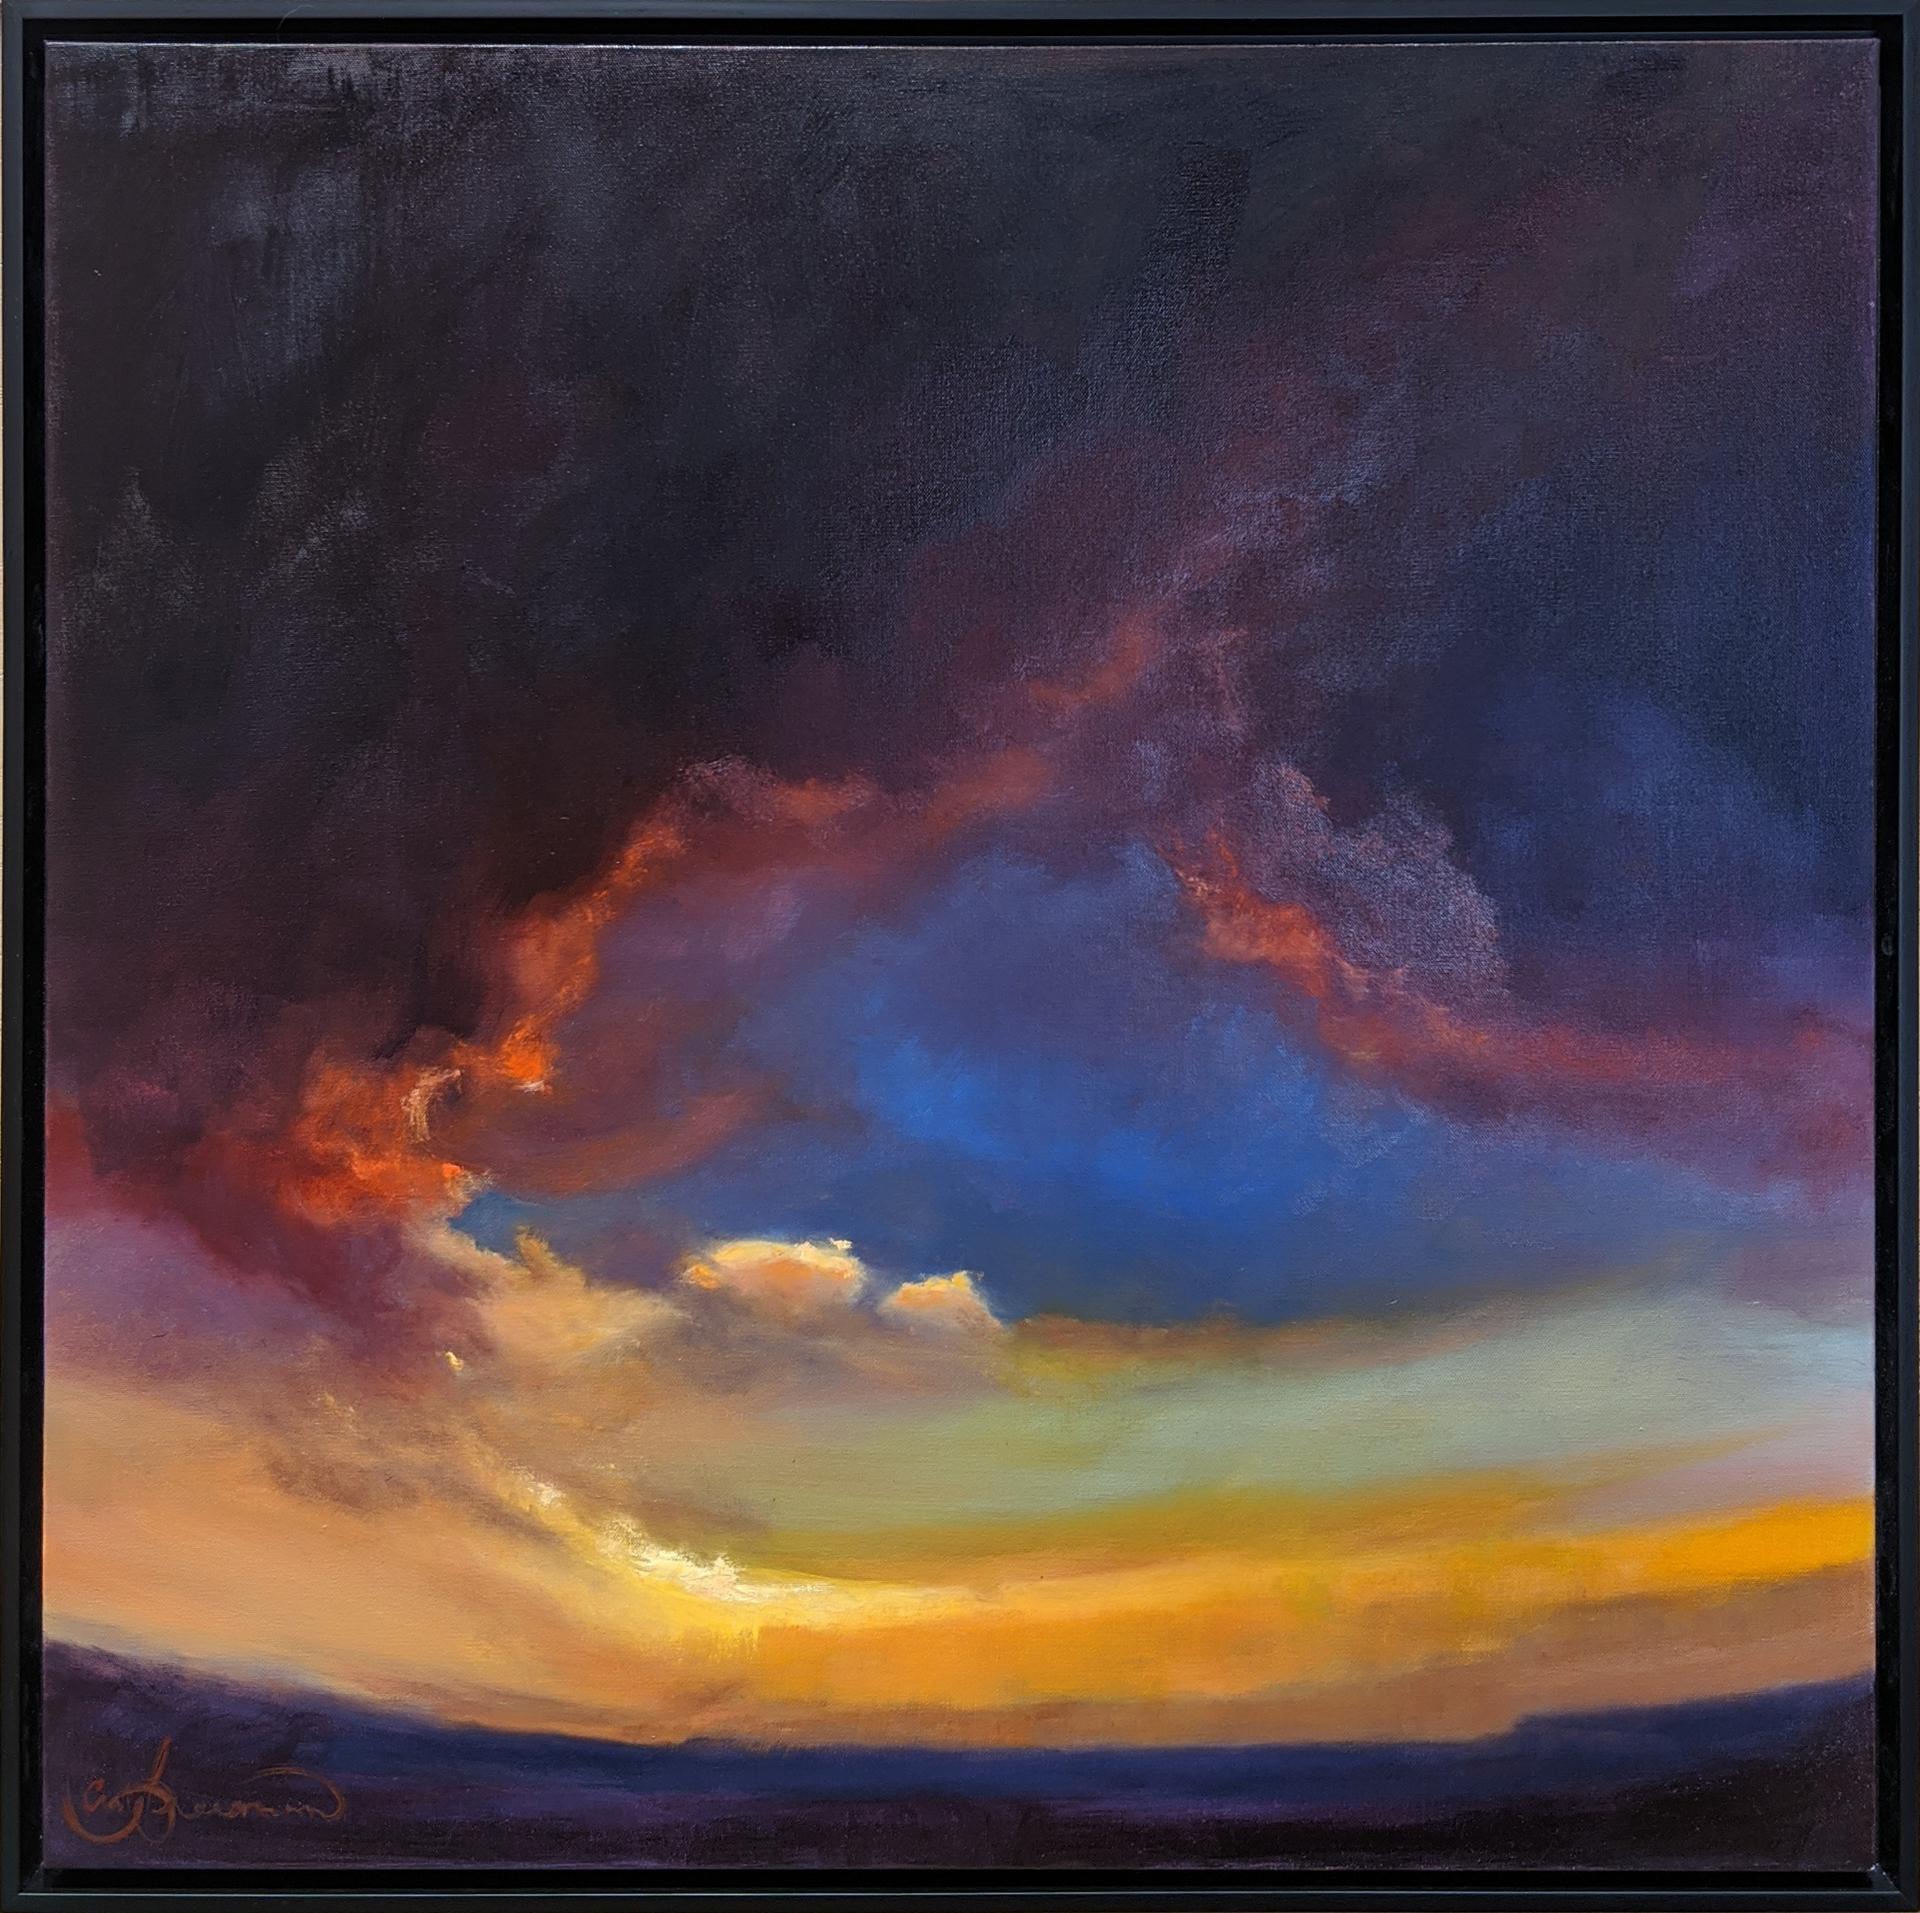 Circle of Light by Craig Freeman